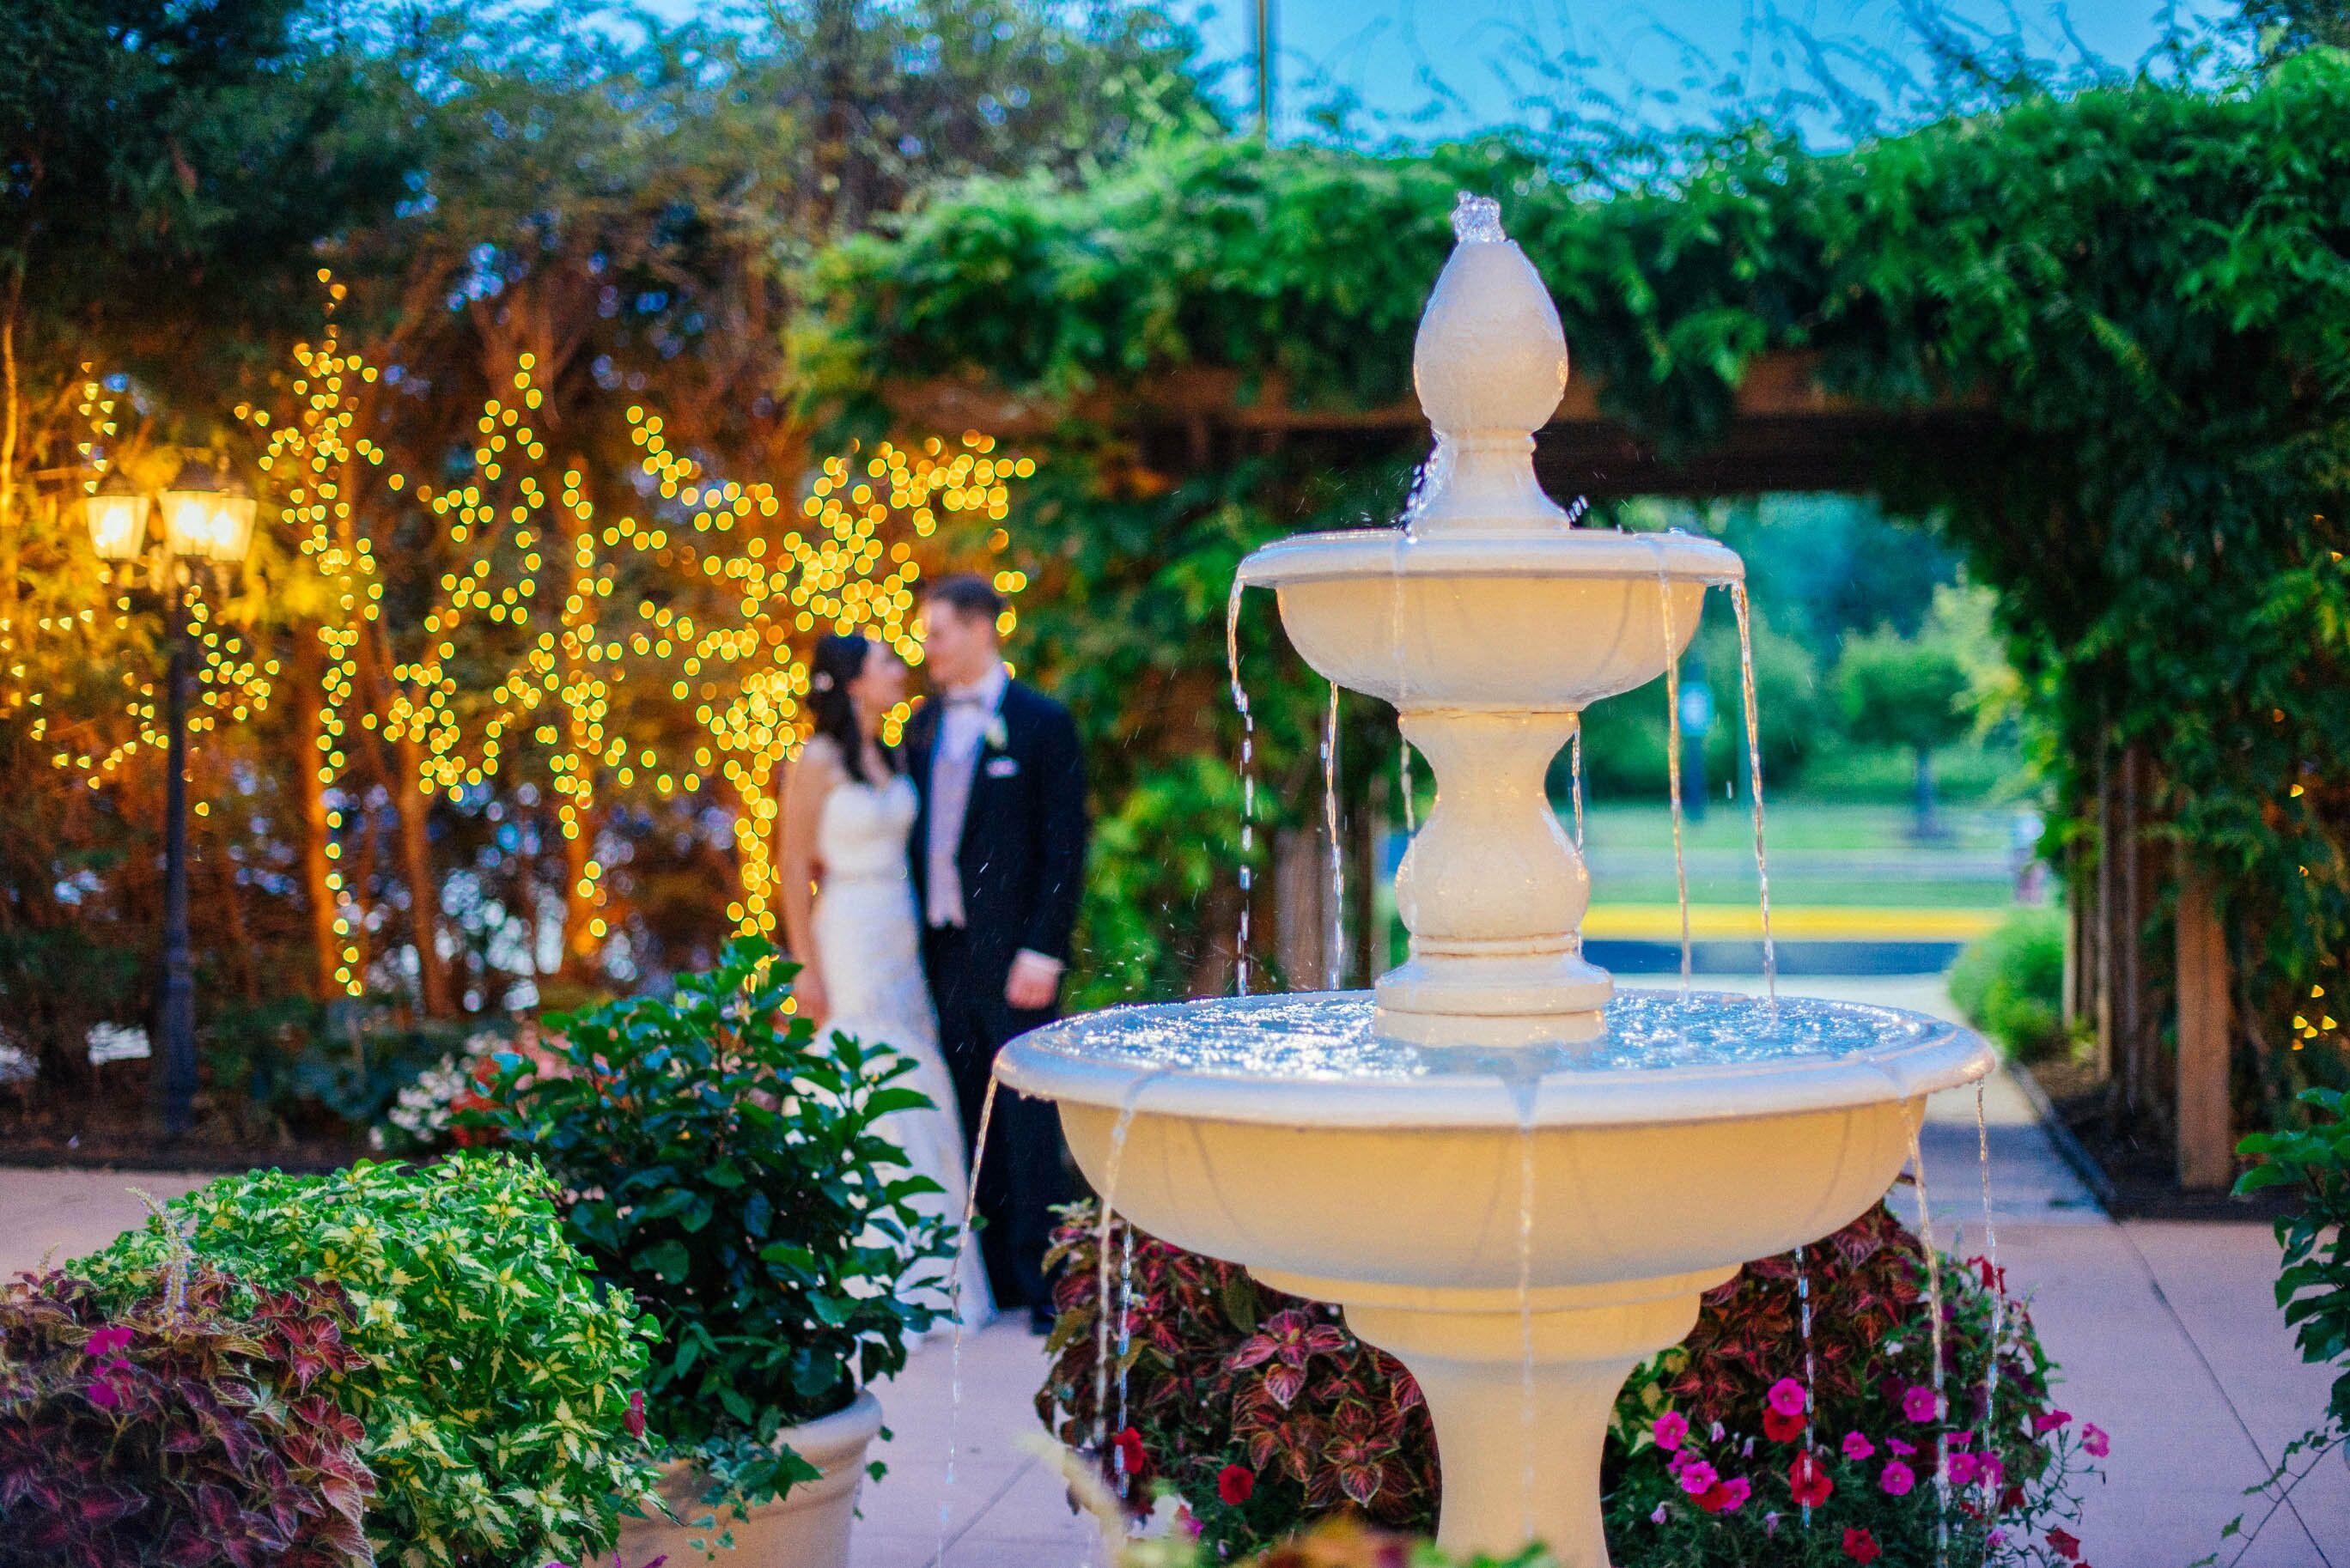 Wedding Reception Venues in Manassas, VA - The Knot